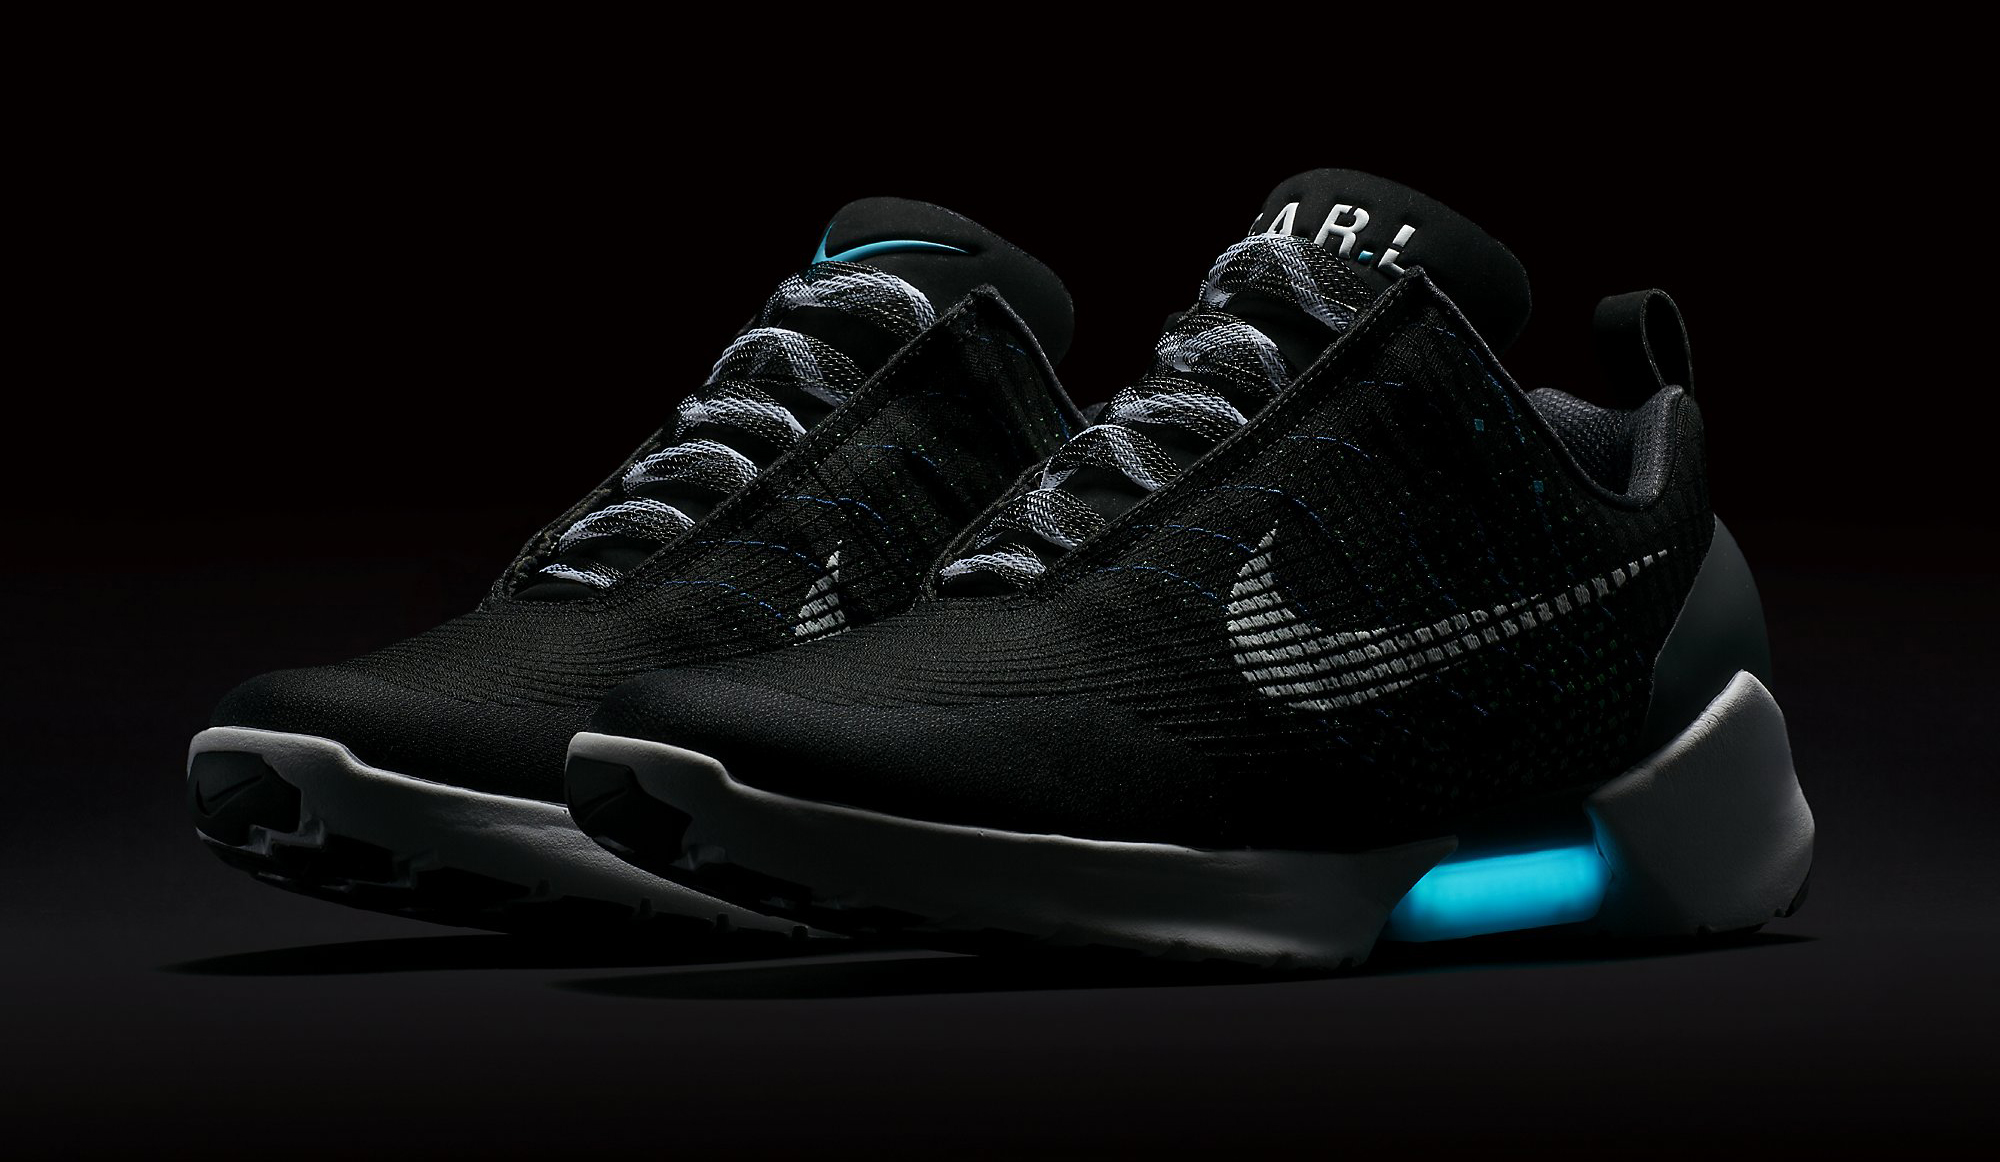 Nike Hyperadapt 843871-001